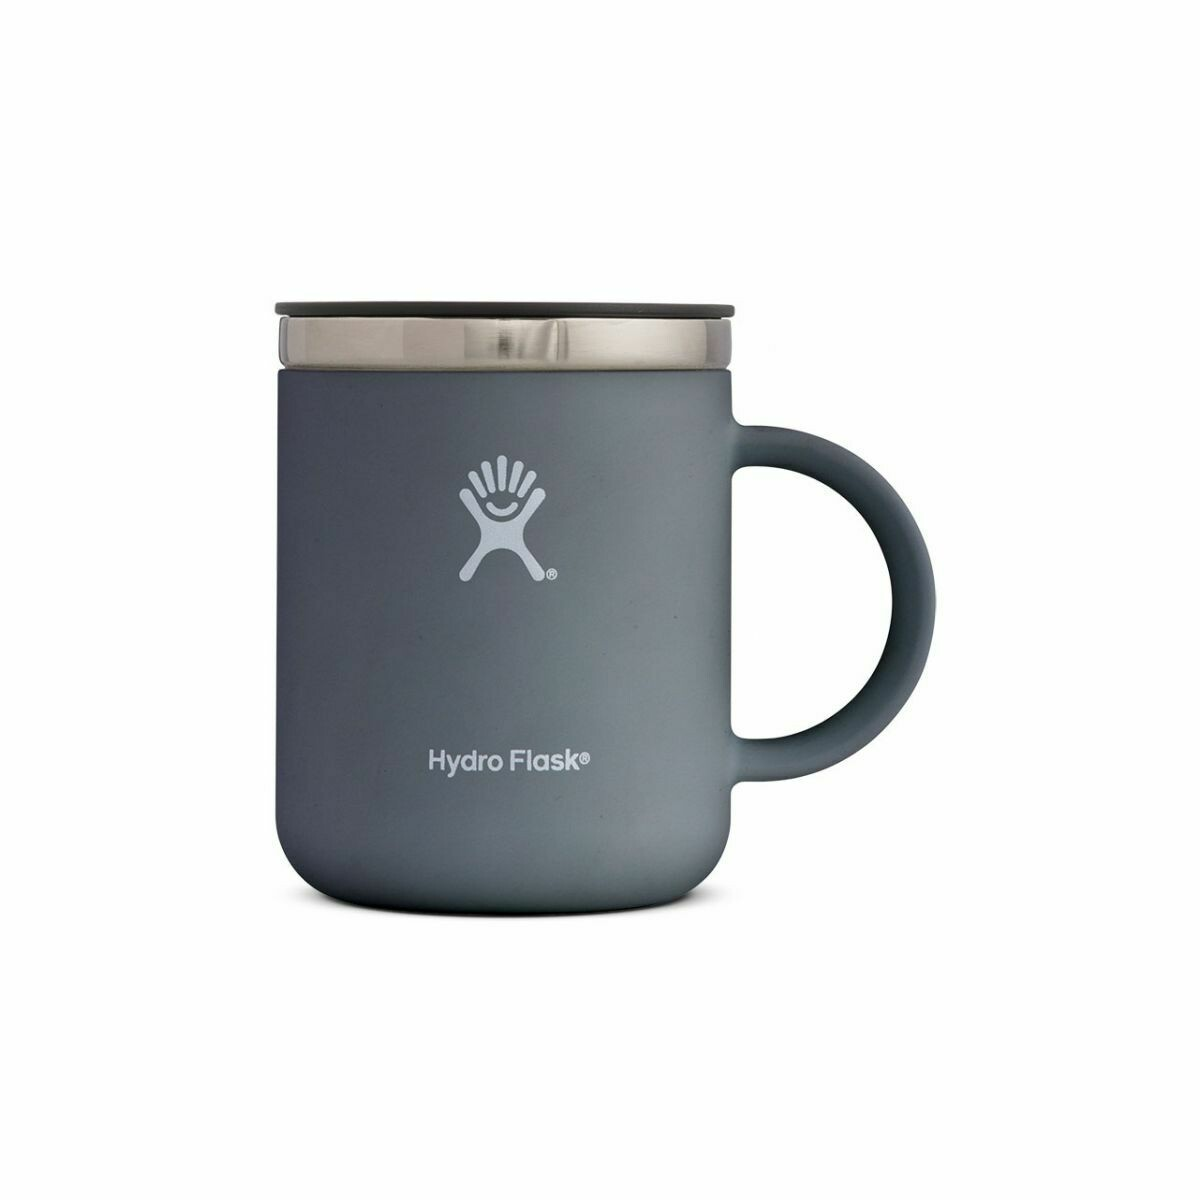 Hydro Flask 12 oz Coffee Mug STONE